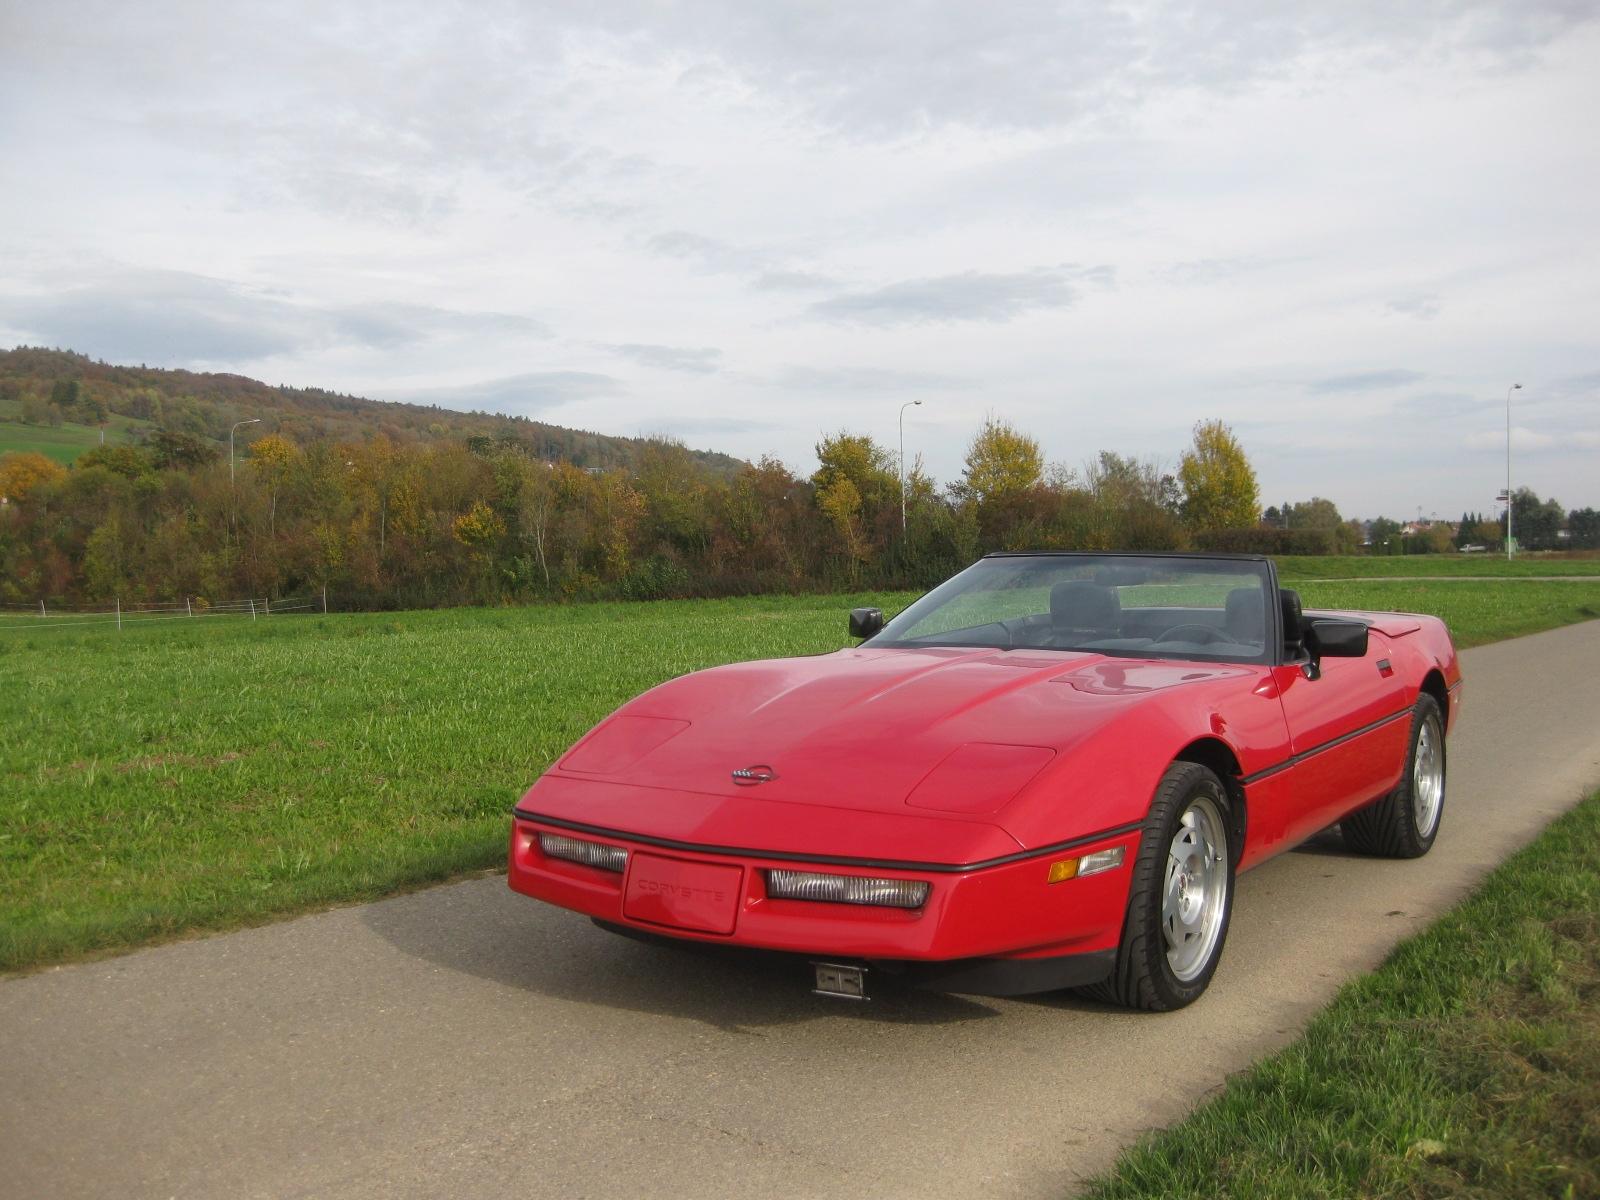 Chevrolet_Corvette_C4_Cabriolet_offen_vorne Breathtaking Ferrari Mondial T Cabrio Kaufen Cars Trend